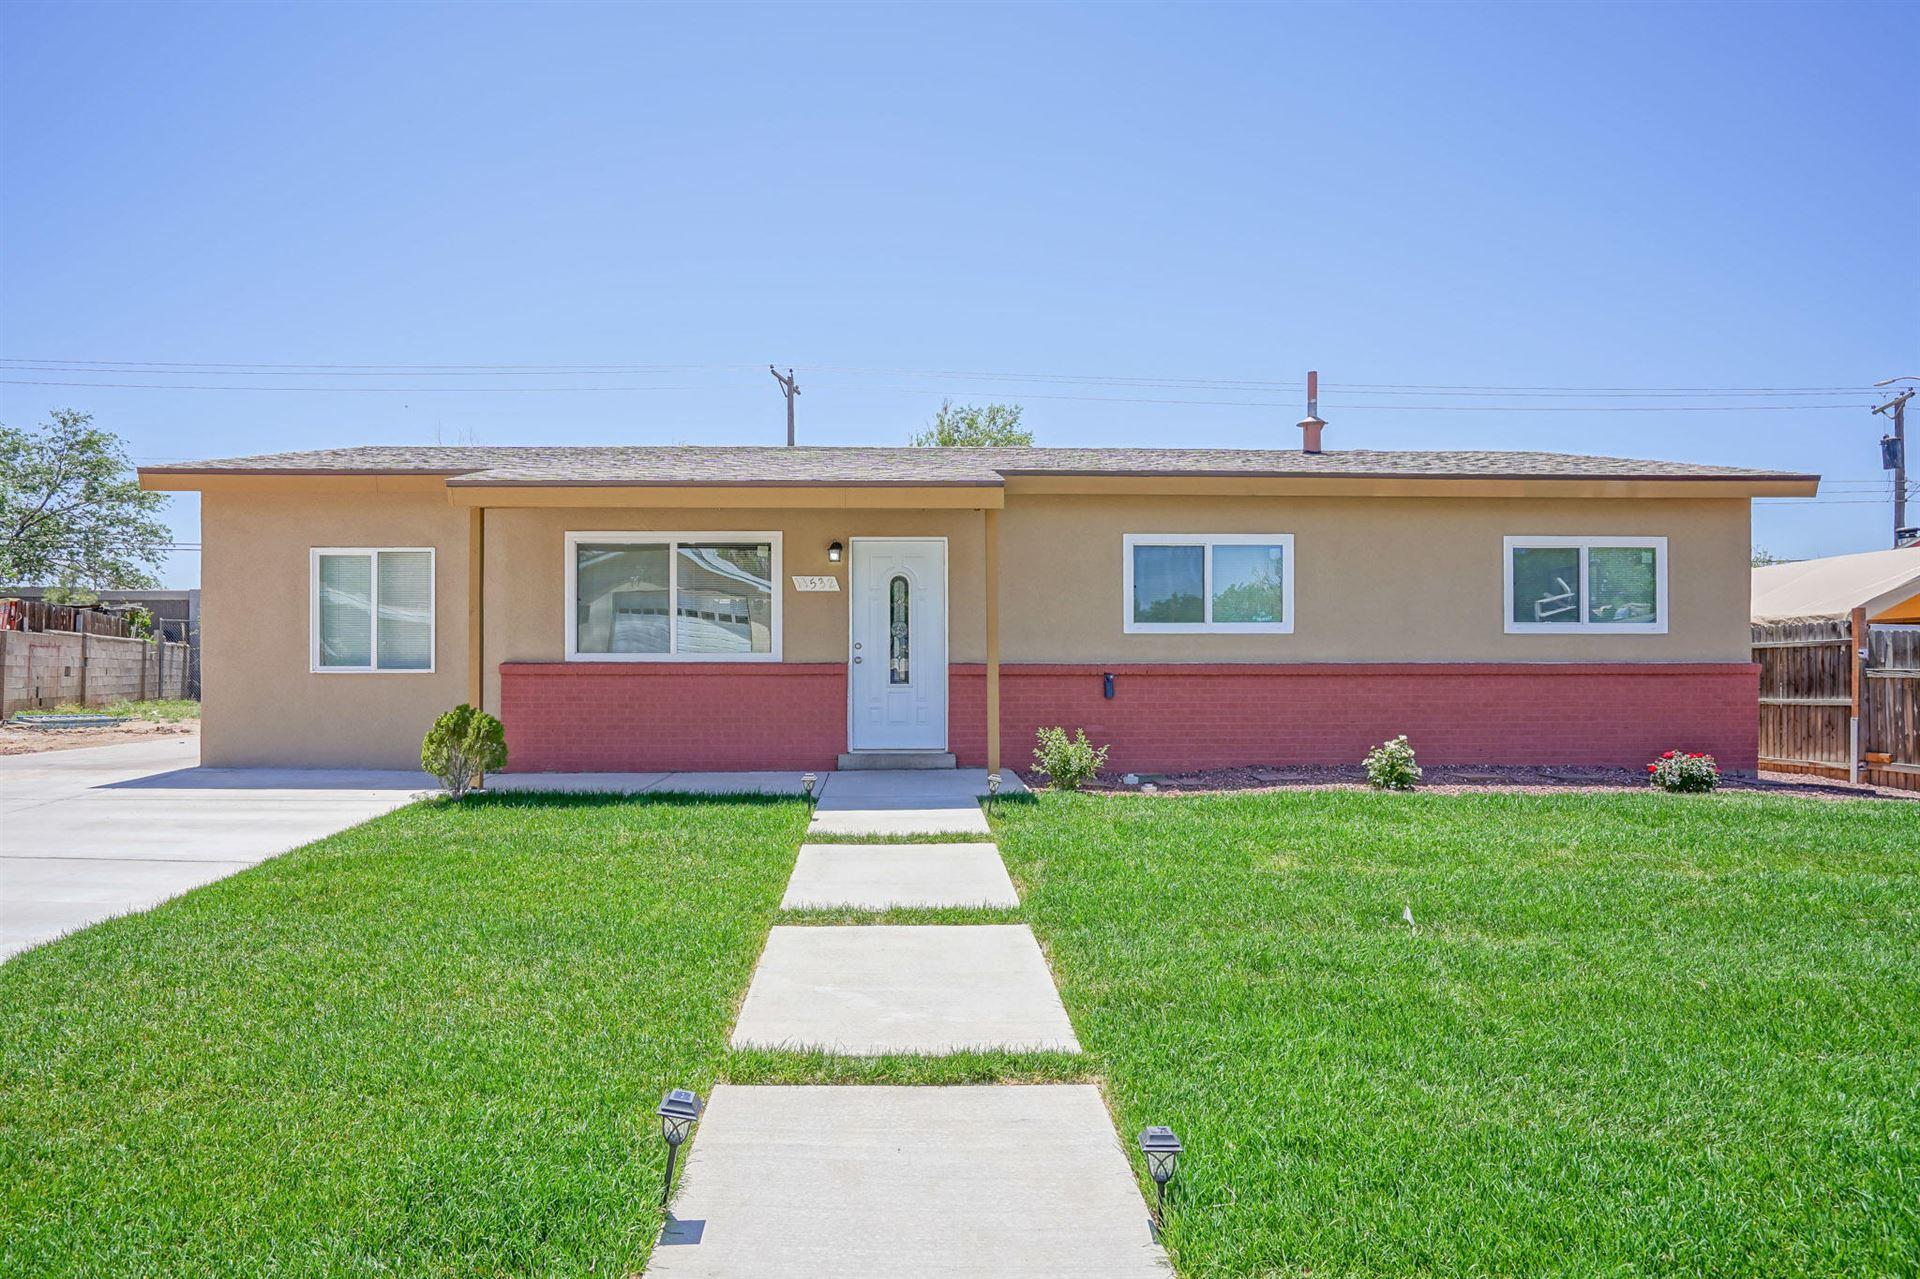 Photo of 11532 N Freeway Place NE, Albuquerque, NM 87123 (MLS # 991500)